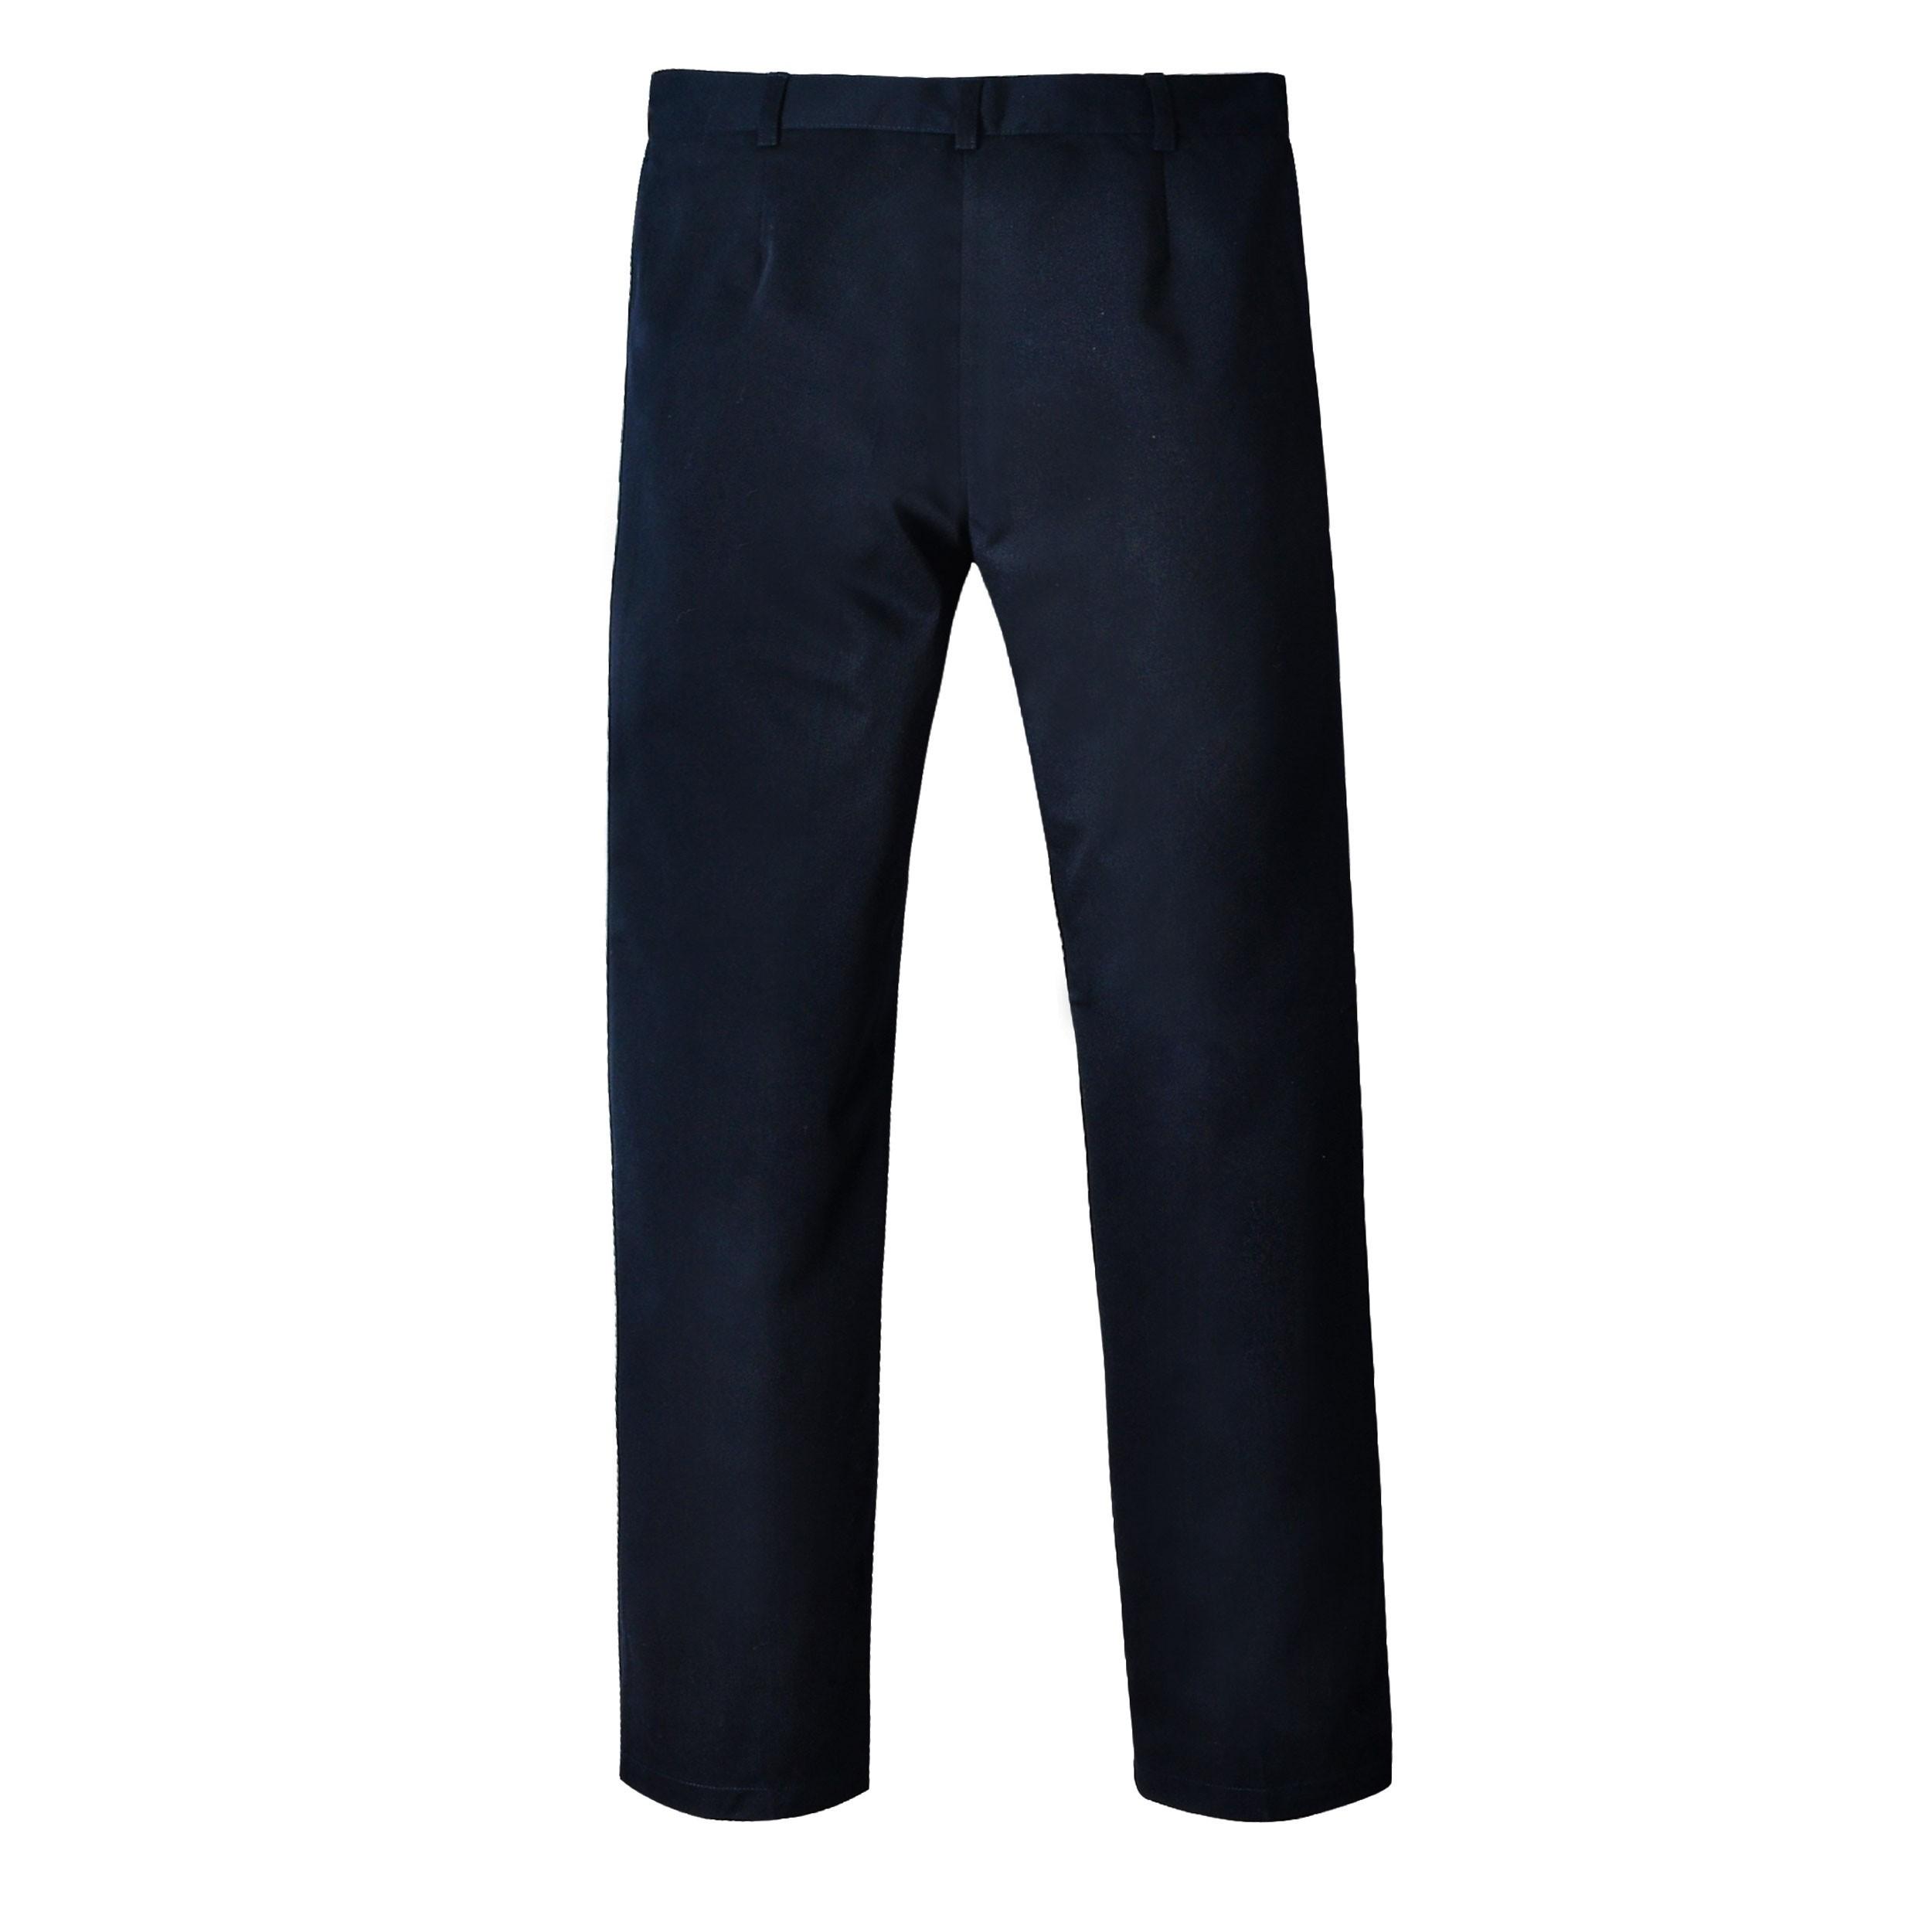 Pantalones Pantalon Ejecutivo Clasico Mujer